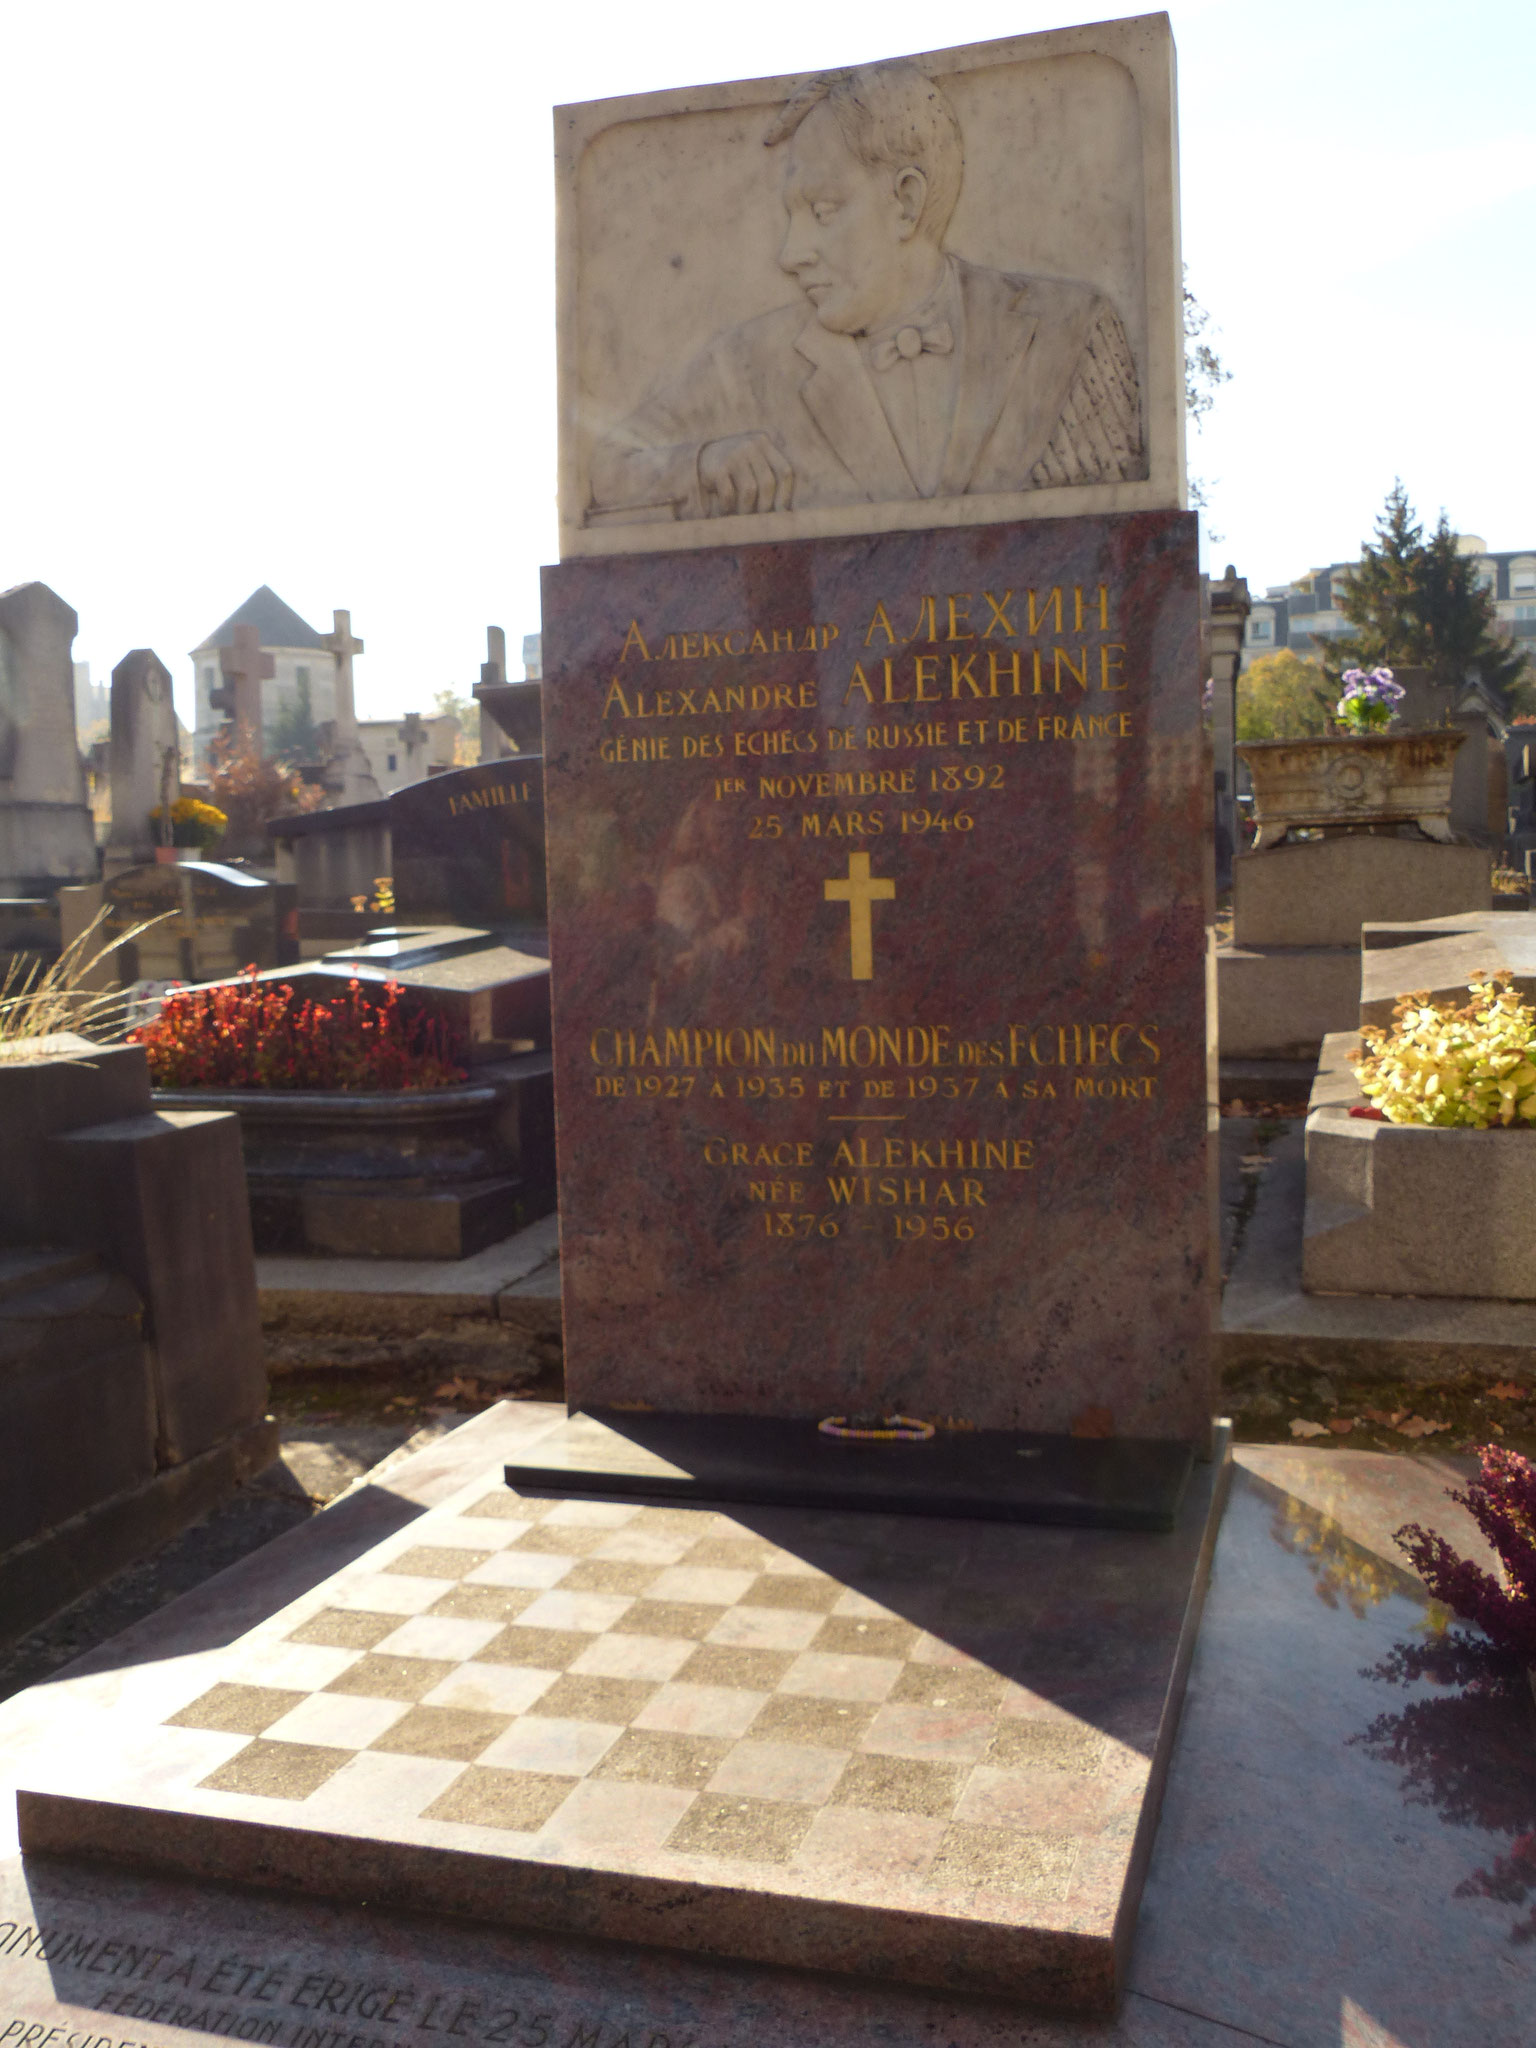 Alexandre Mekhine  - Génie des échecs